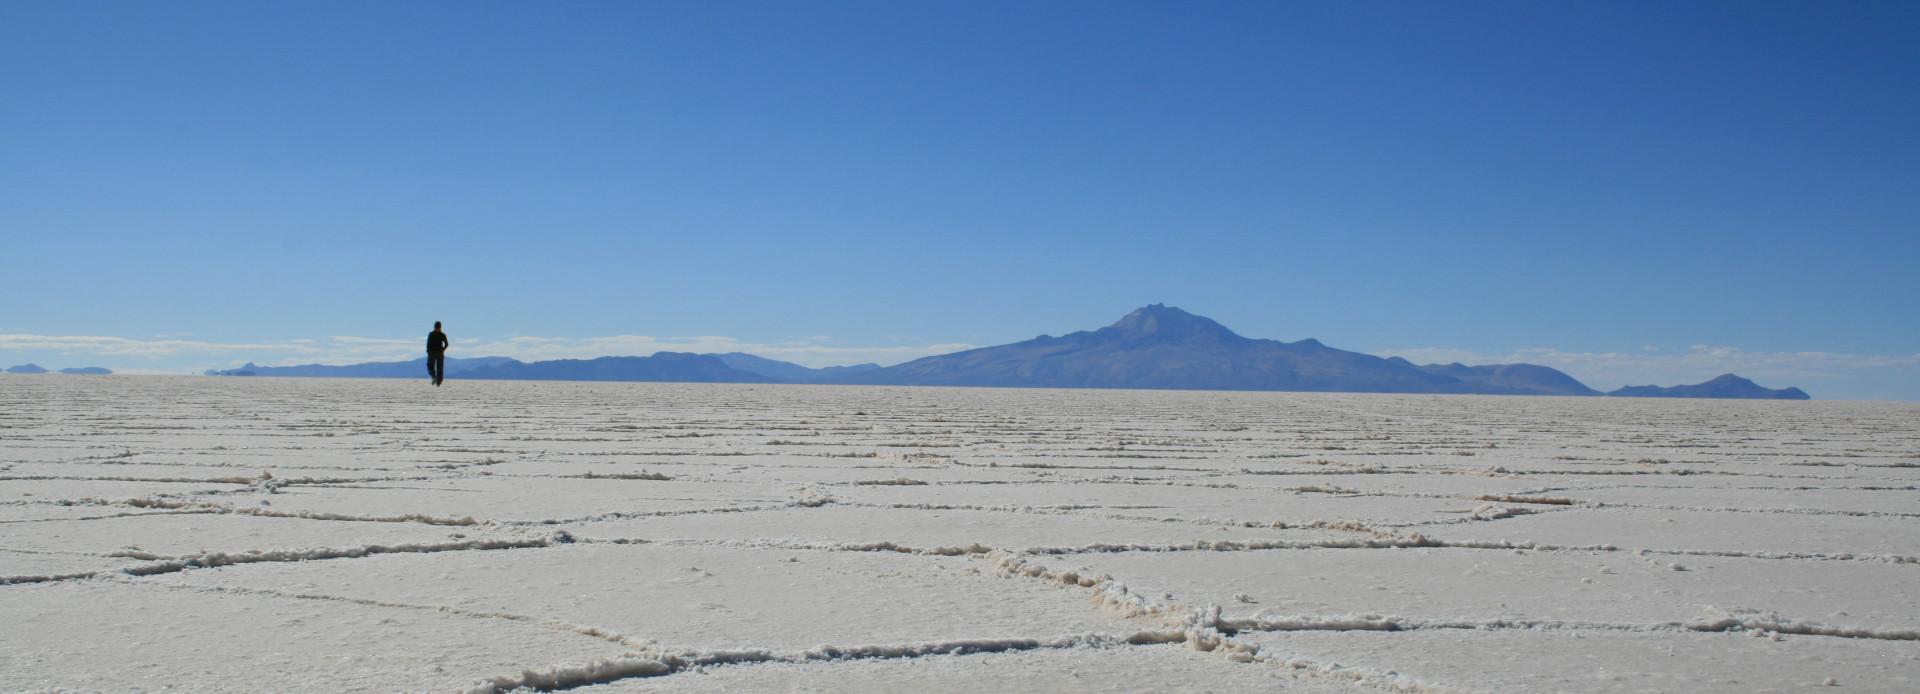 Uyuni Salzsee in Bolivien